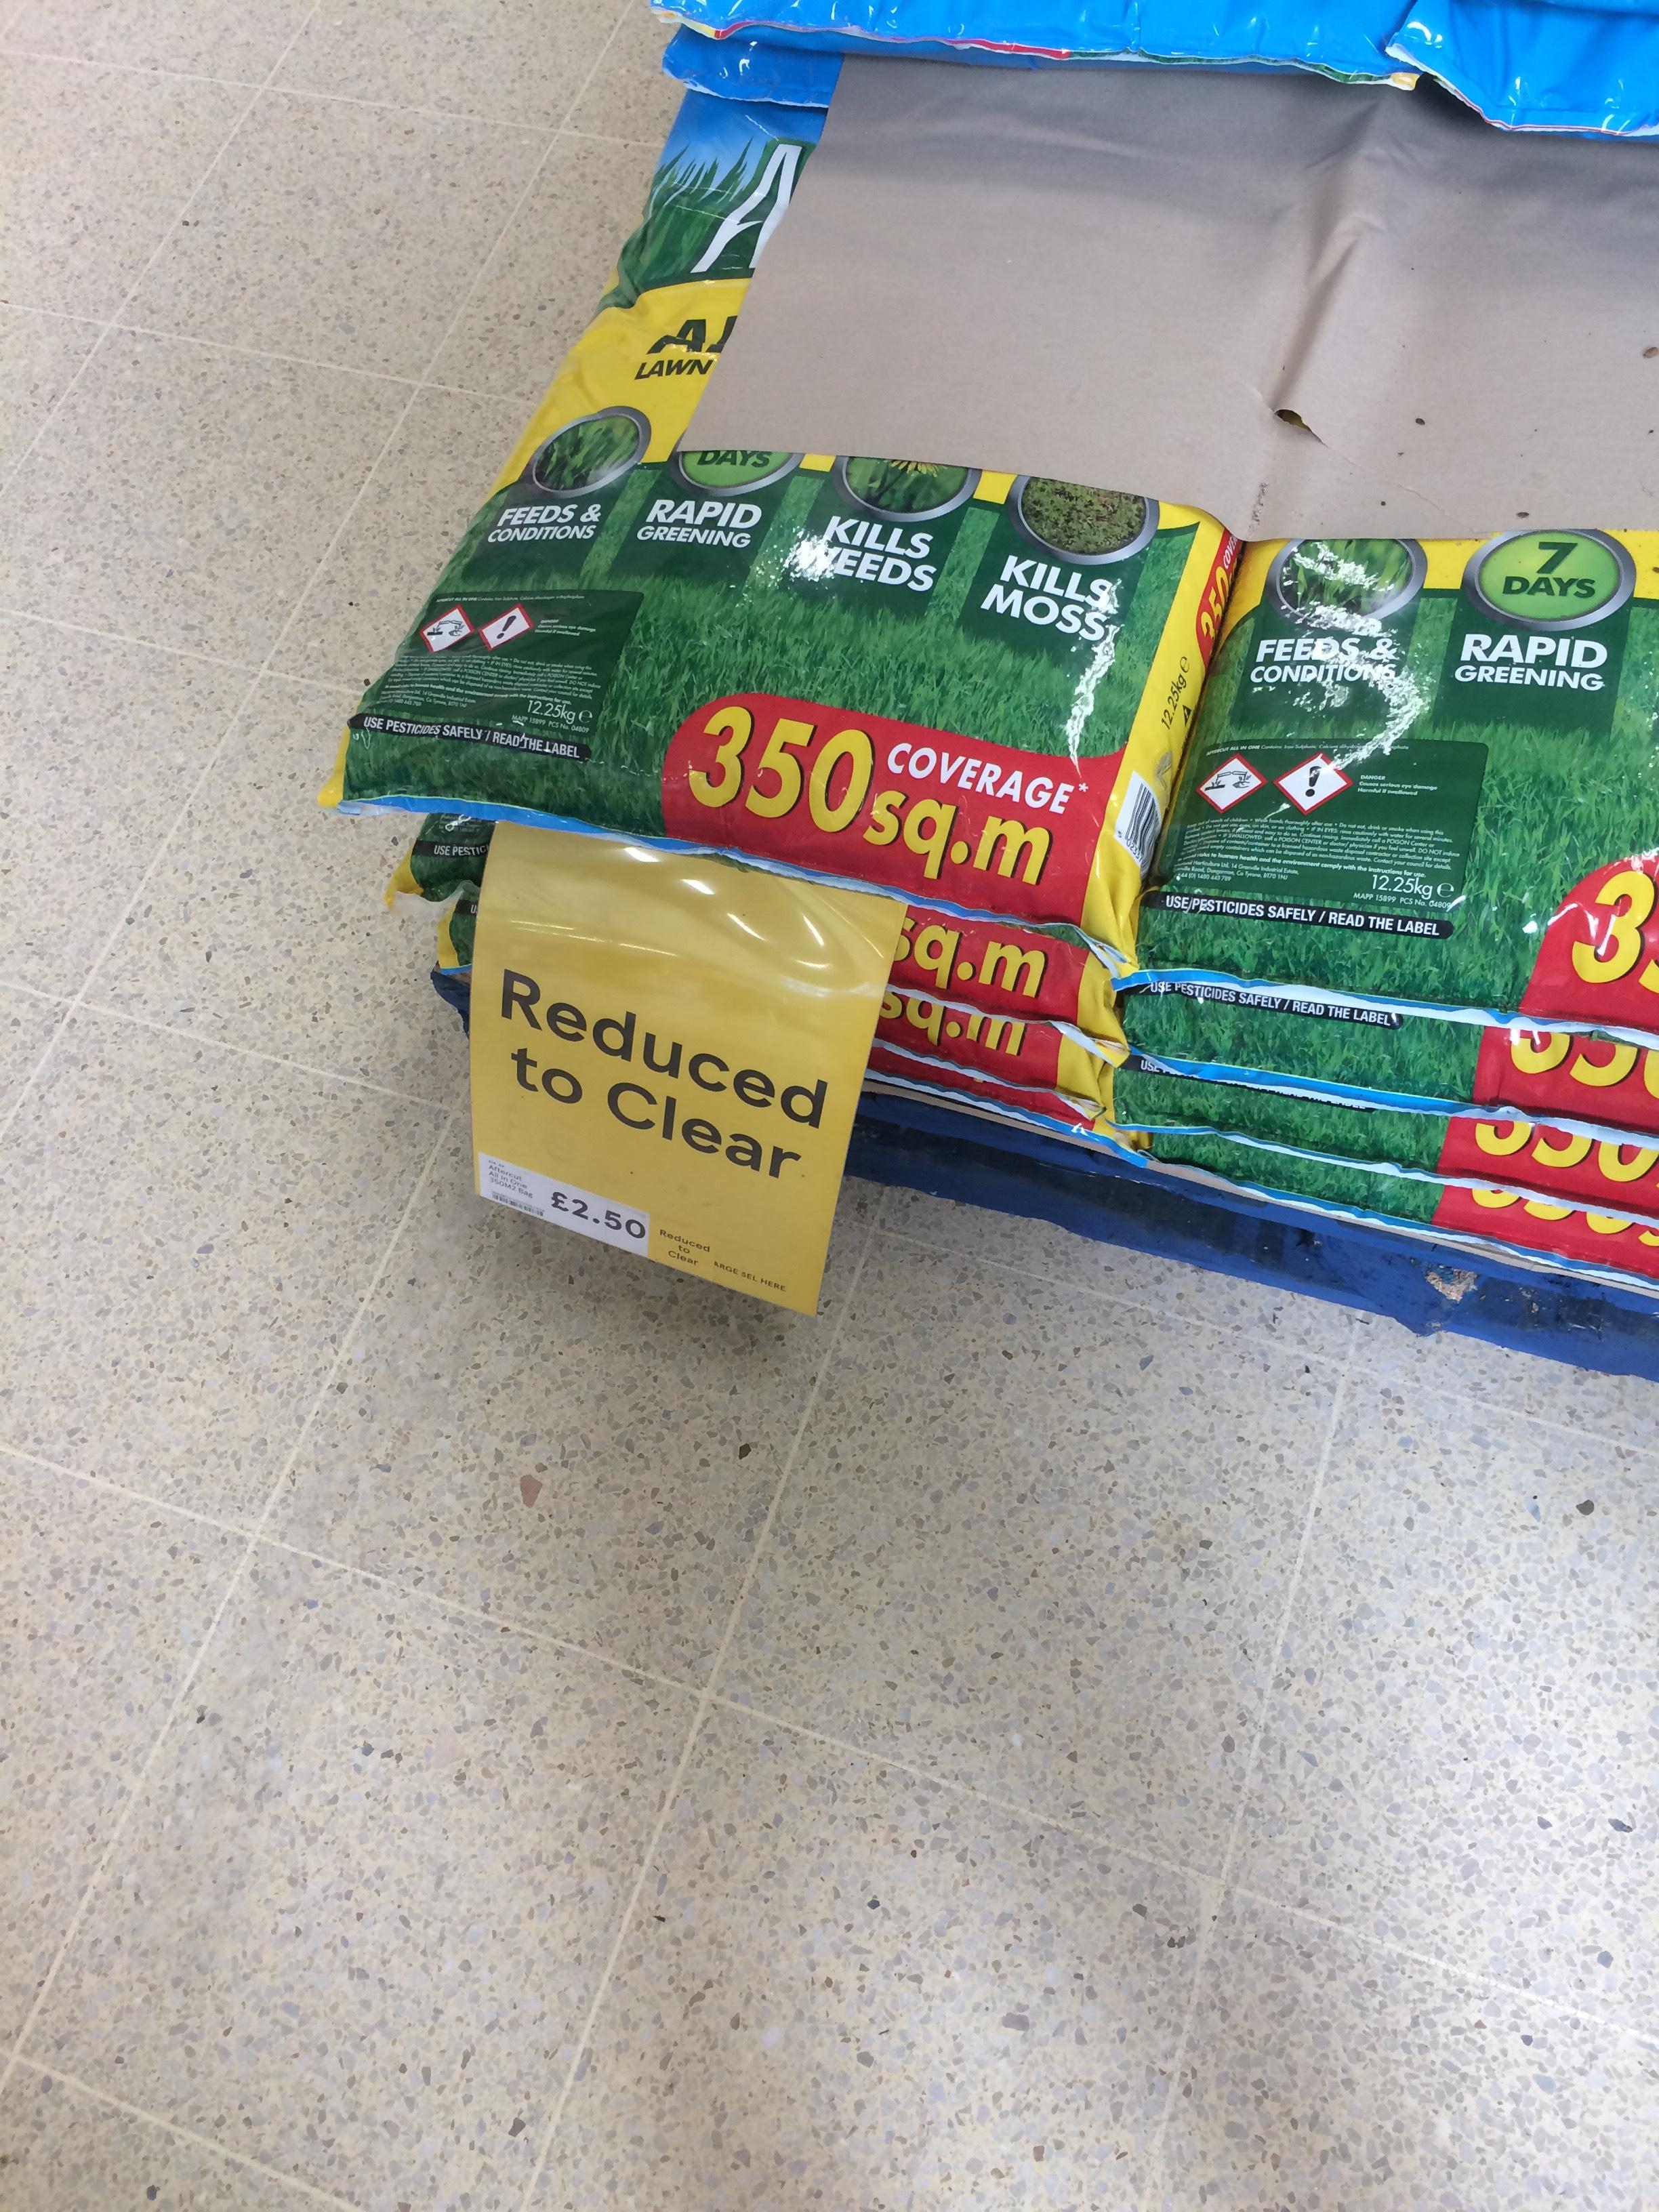 Westland Aftercut Grass Feed ' All in One ' 12.25kg bag £2.50 @ Tesco